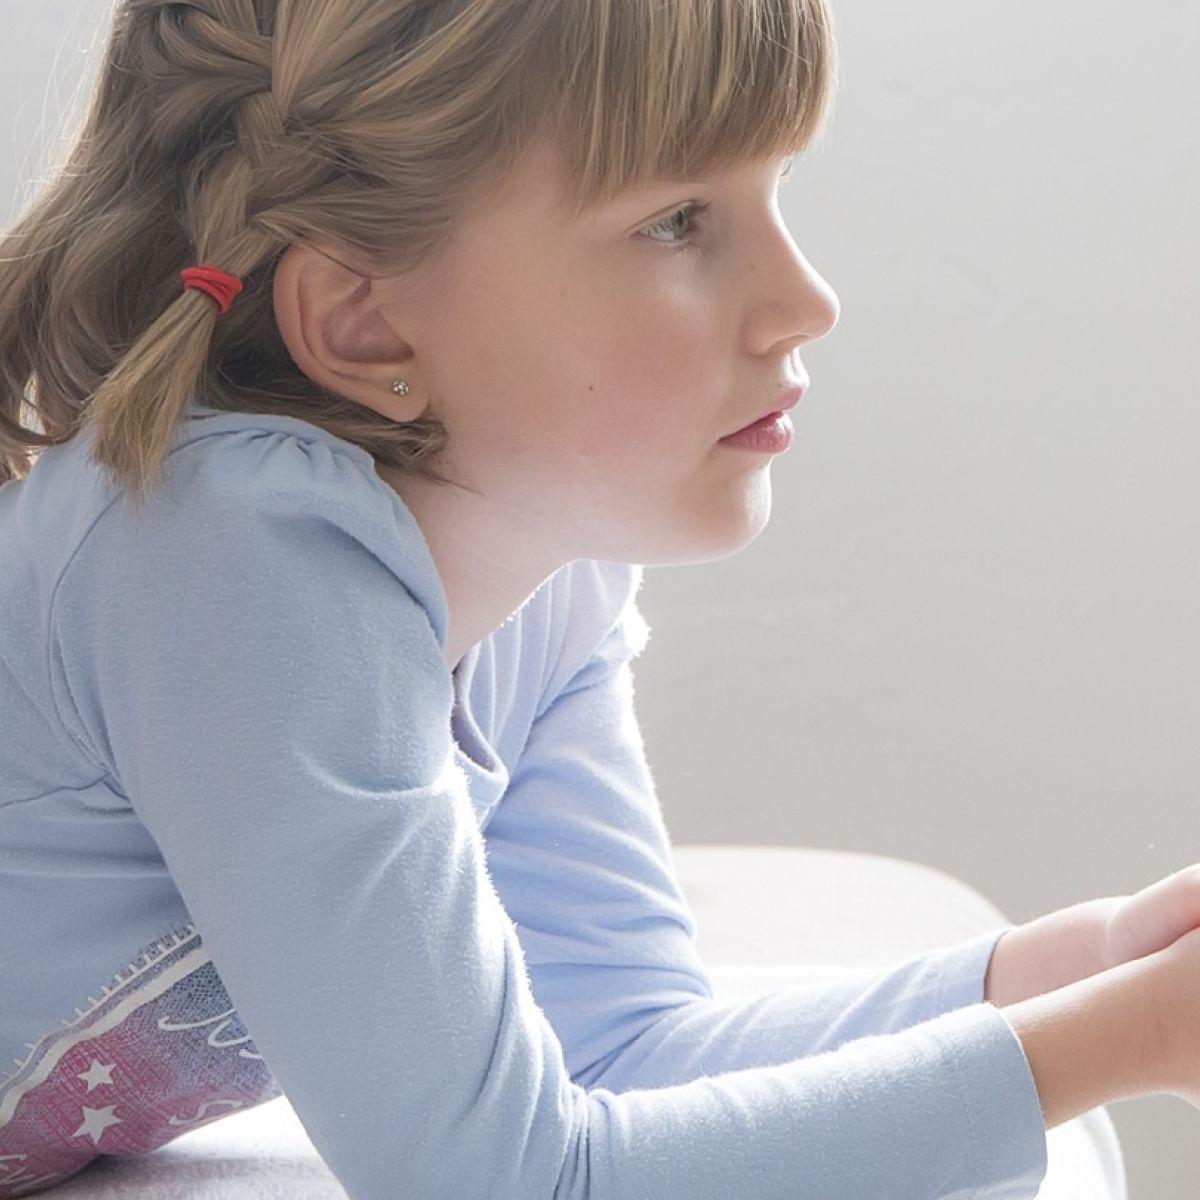 Modern children run slower than their parents